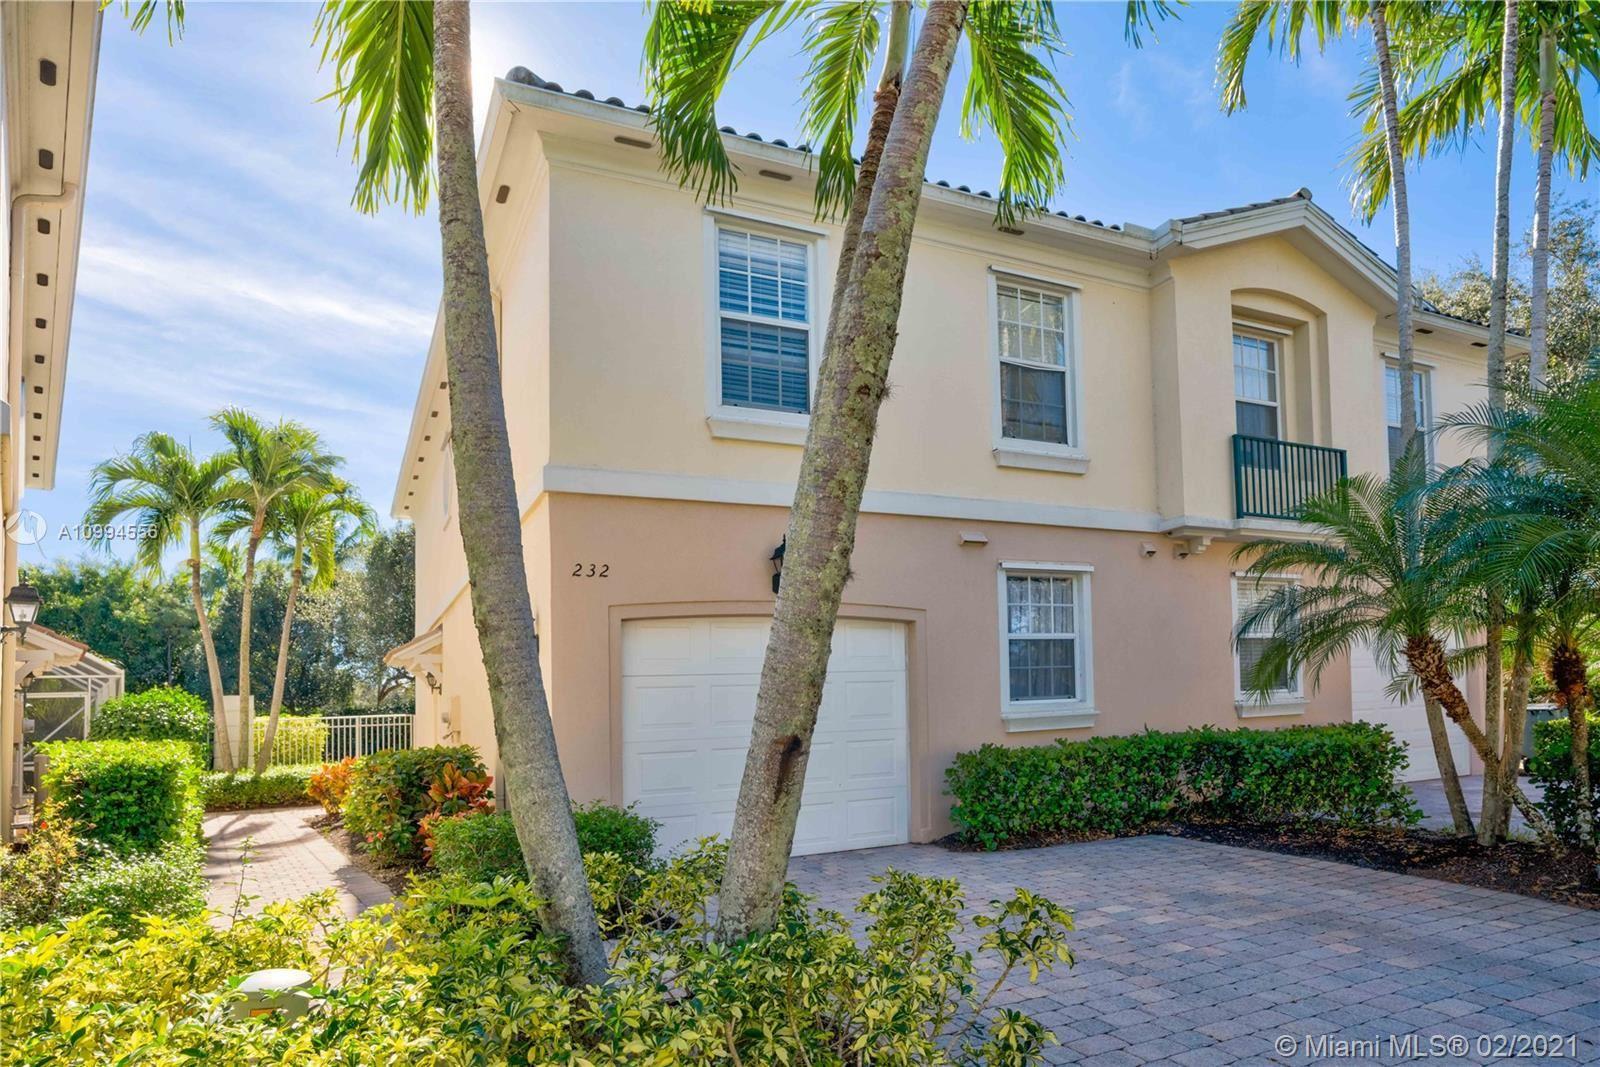 232 Fortuna Dr, Palm Beach Gardens, FL 33410 - #: A10994556